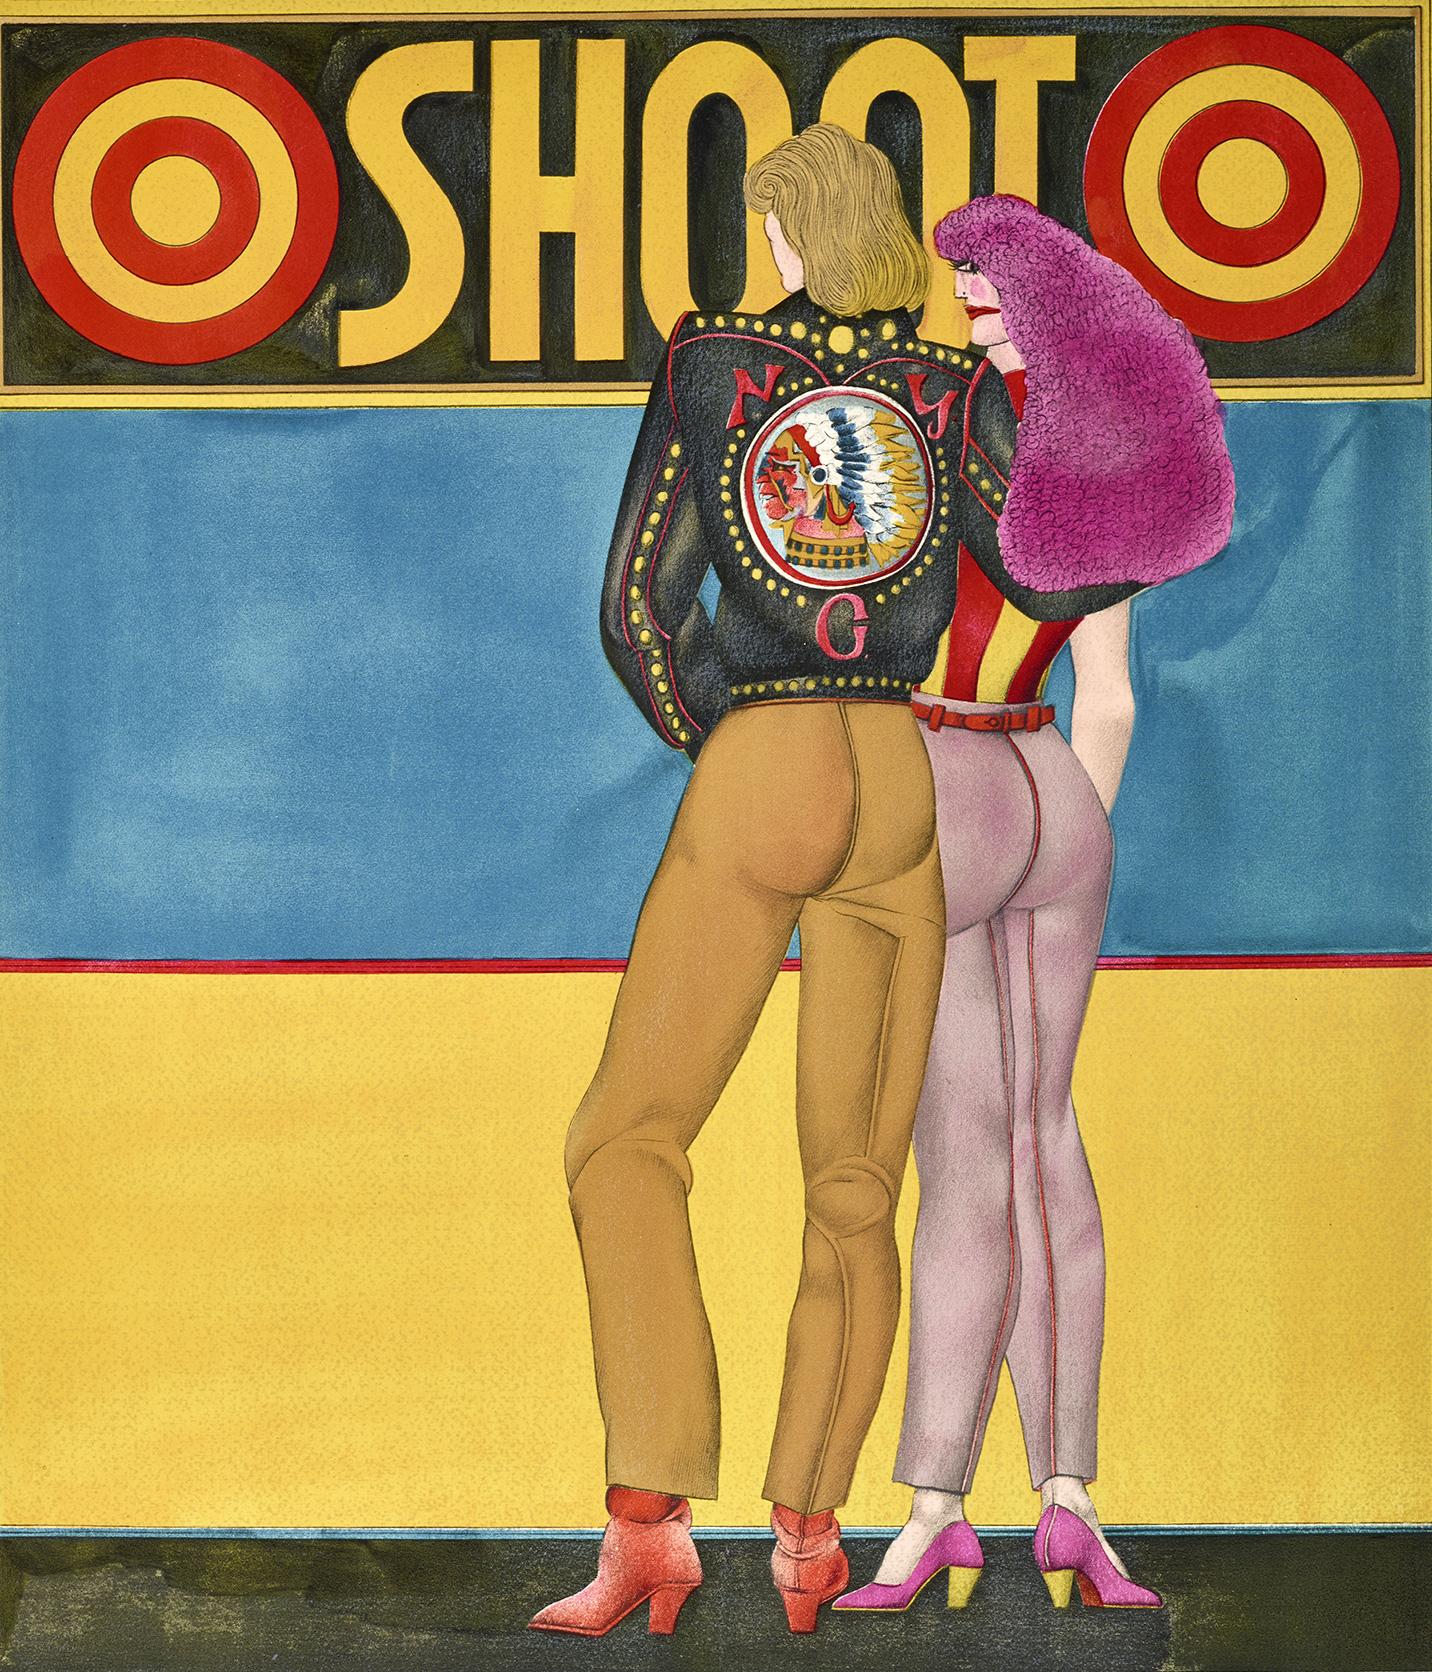 Shoot, 1969